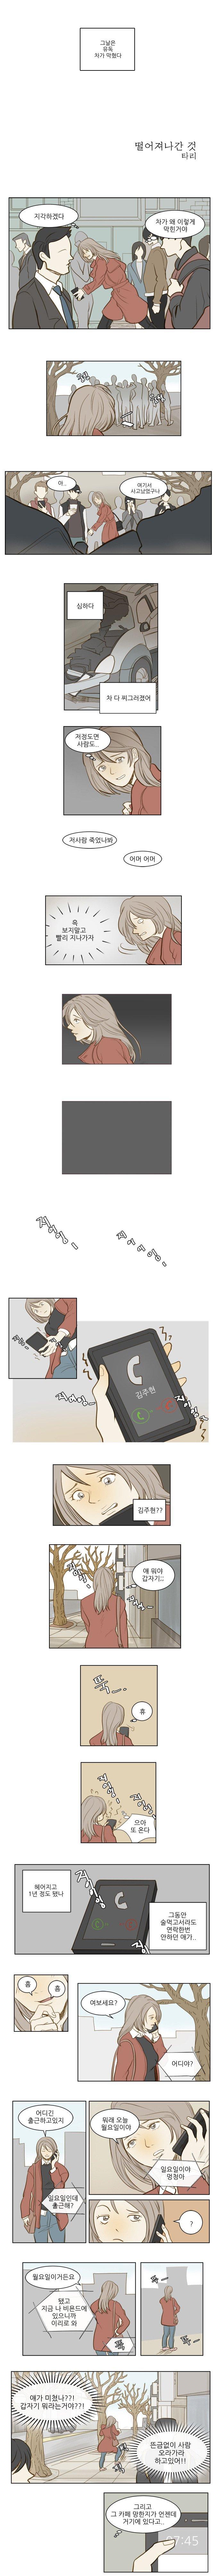 1.jpg 시간은 거꾸로 흐른다.manga [BGM] 시간은 거꾸로 간다.manhwa